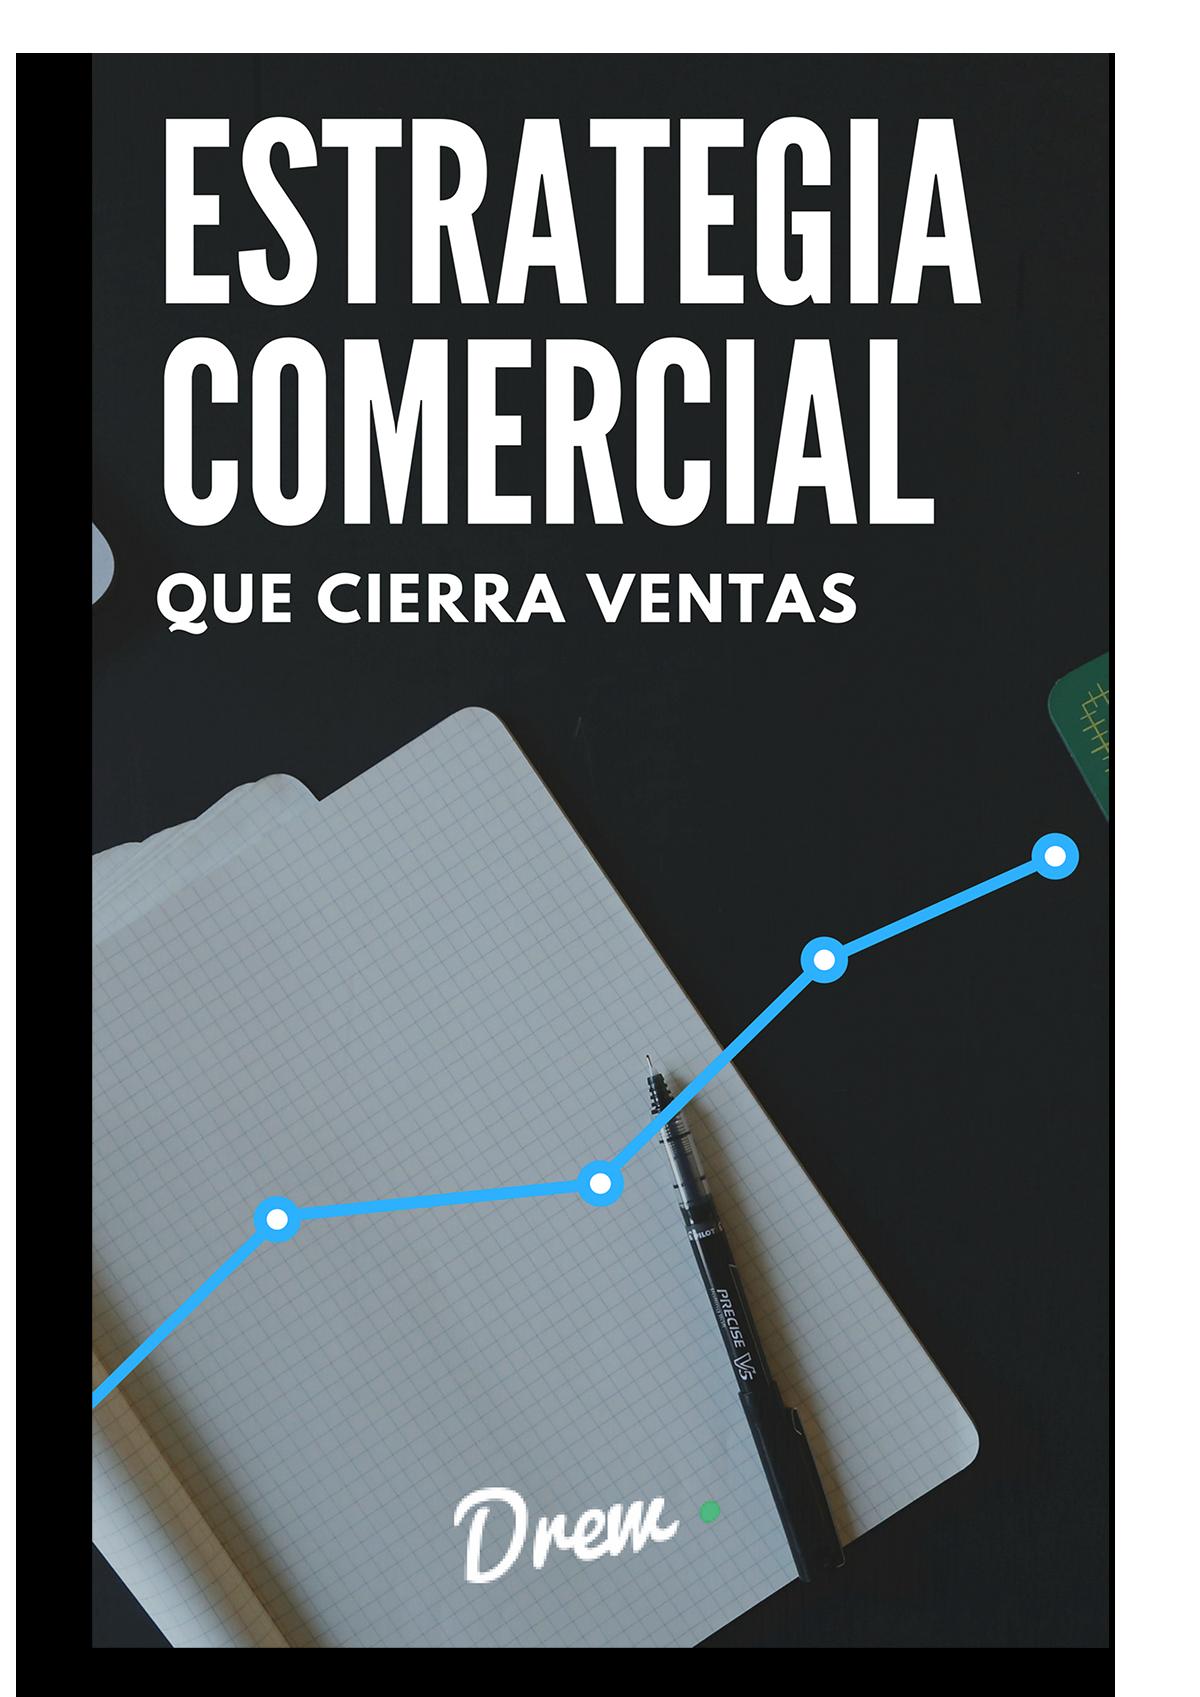 3 Estrategia Comercial